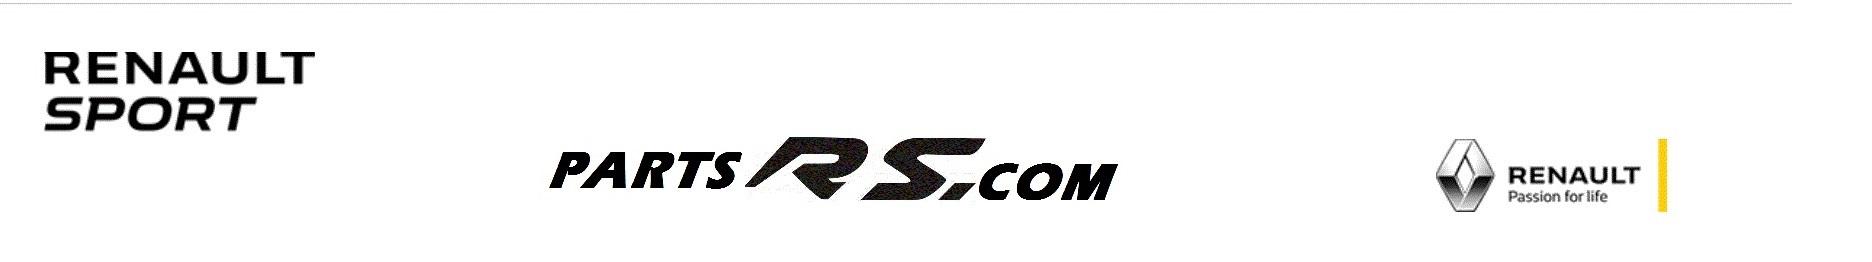 genuine parts for Renault Sport